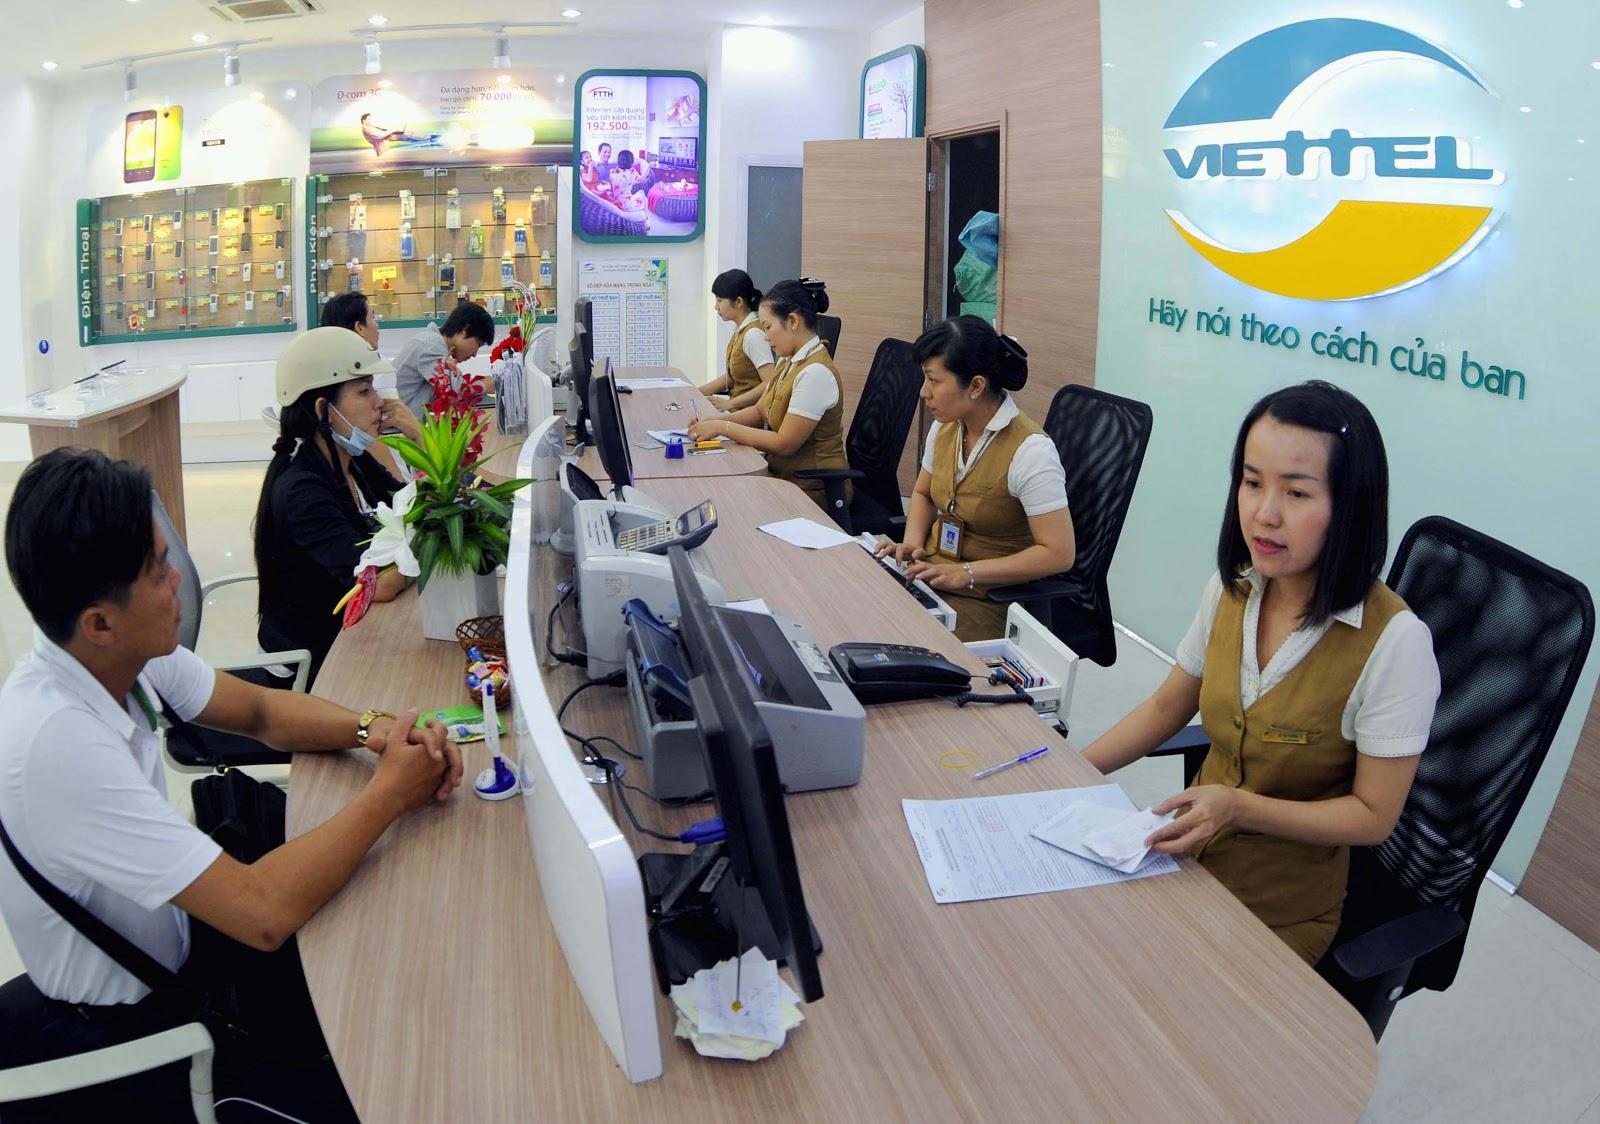 Lam Lai Sim Viettel Khong Chinh Chu O Dau